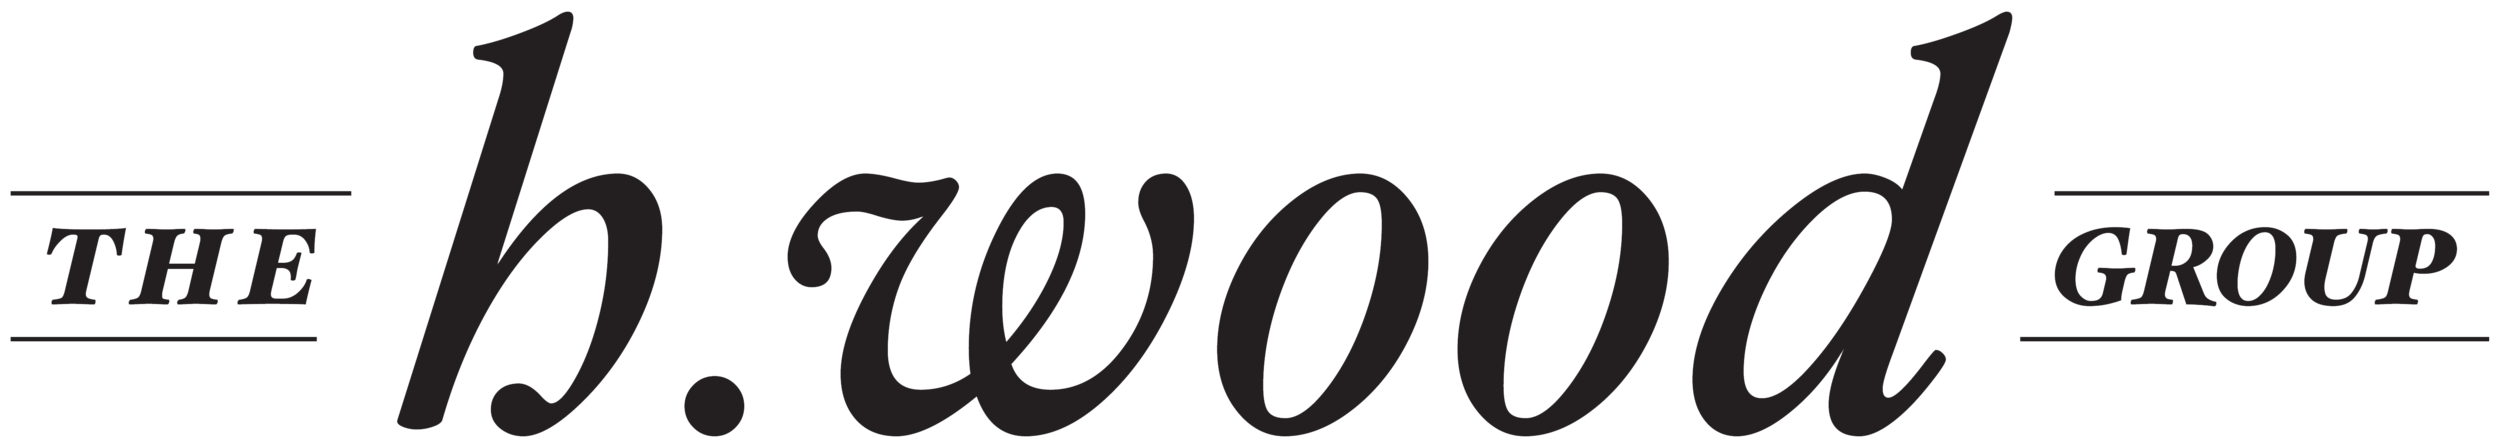 hwood-group-logo.png